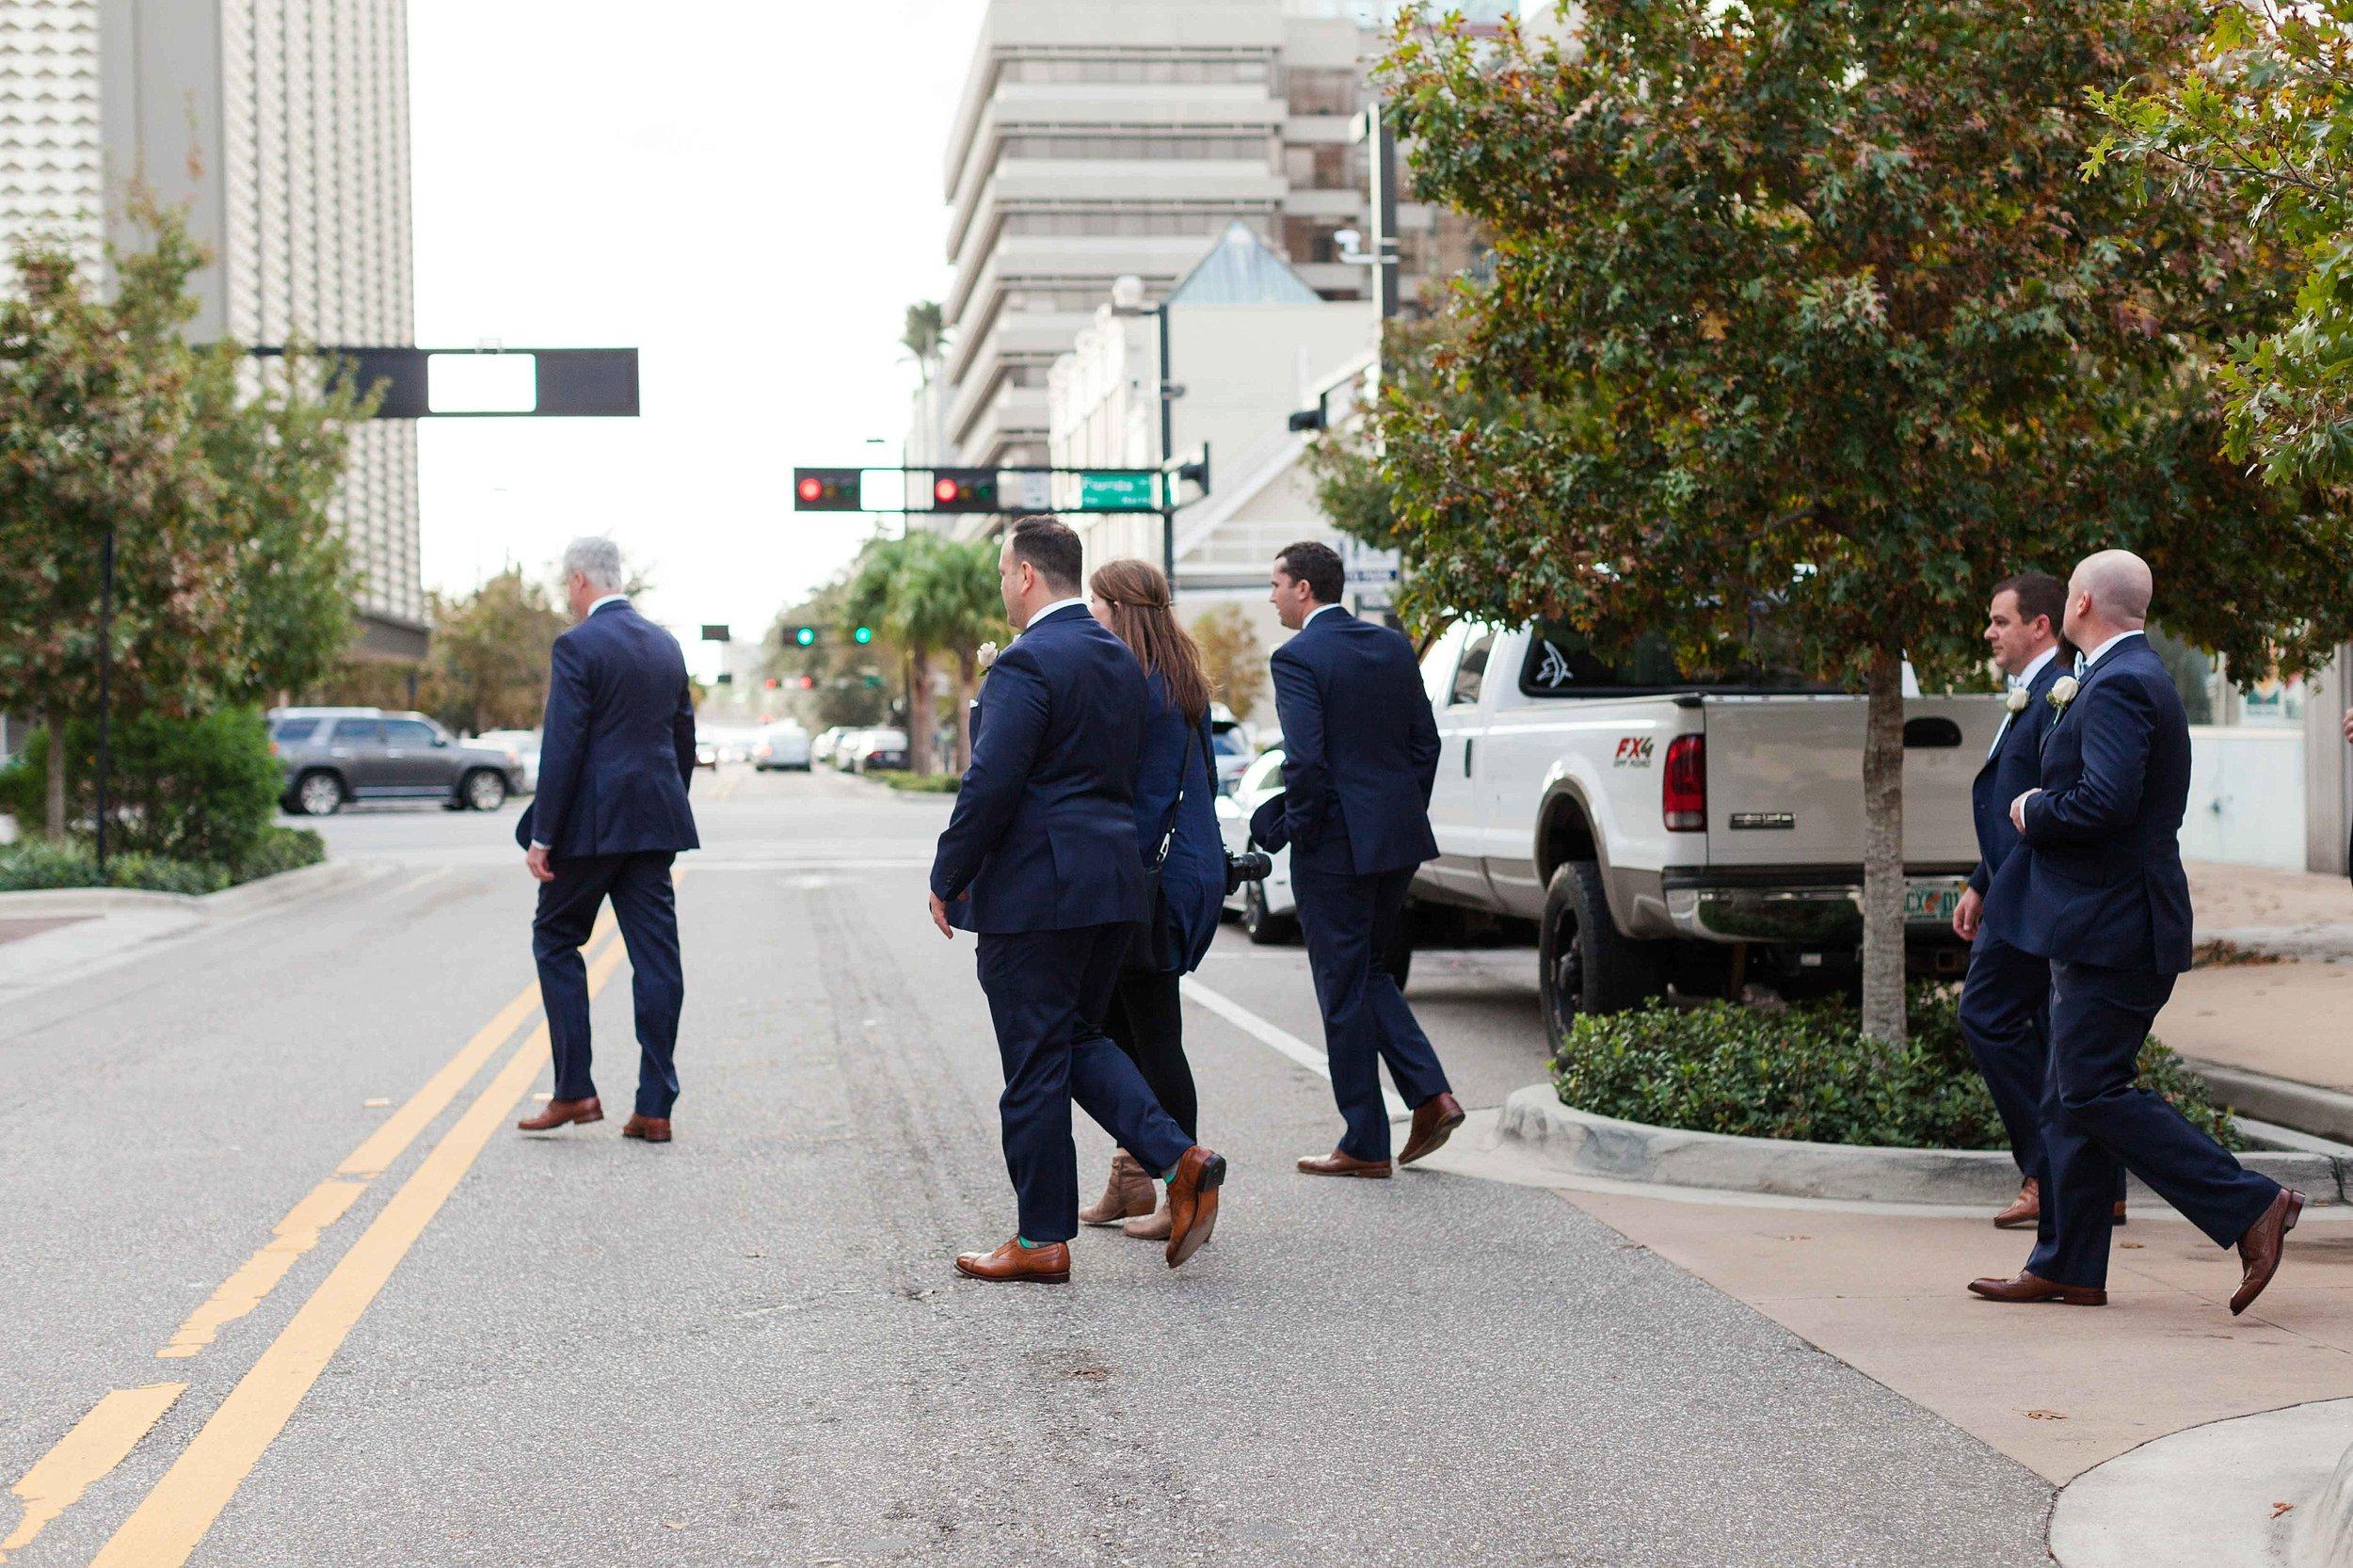 Walking with the guys to take their photos!!